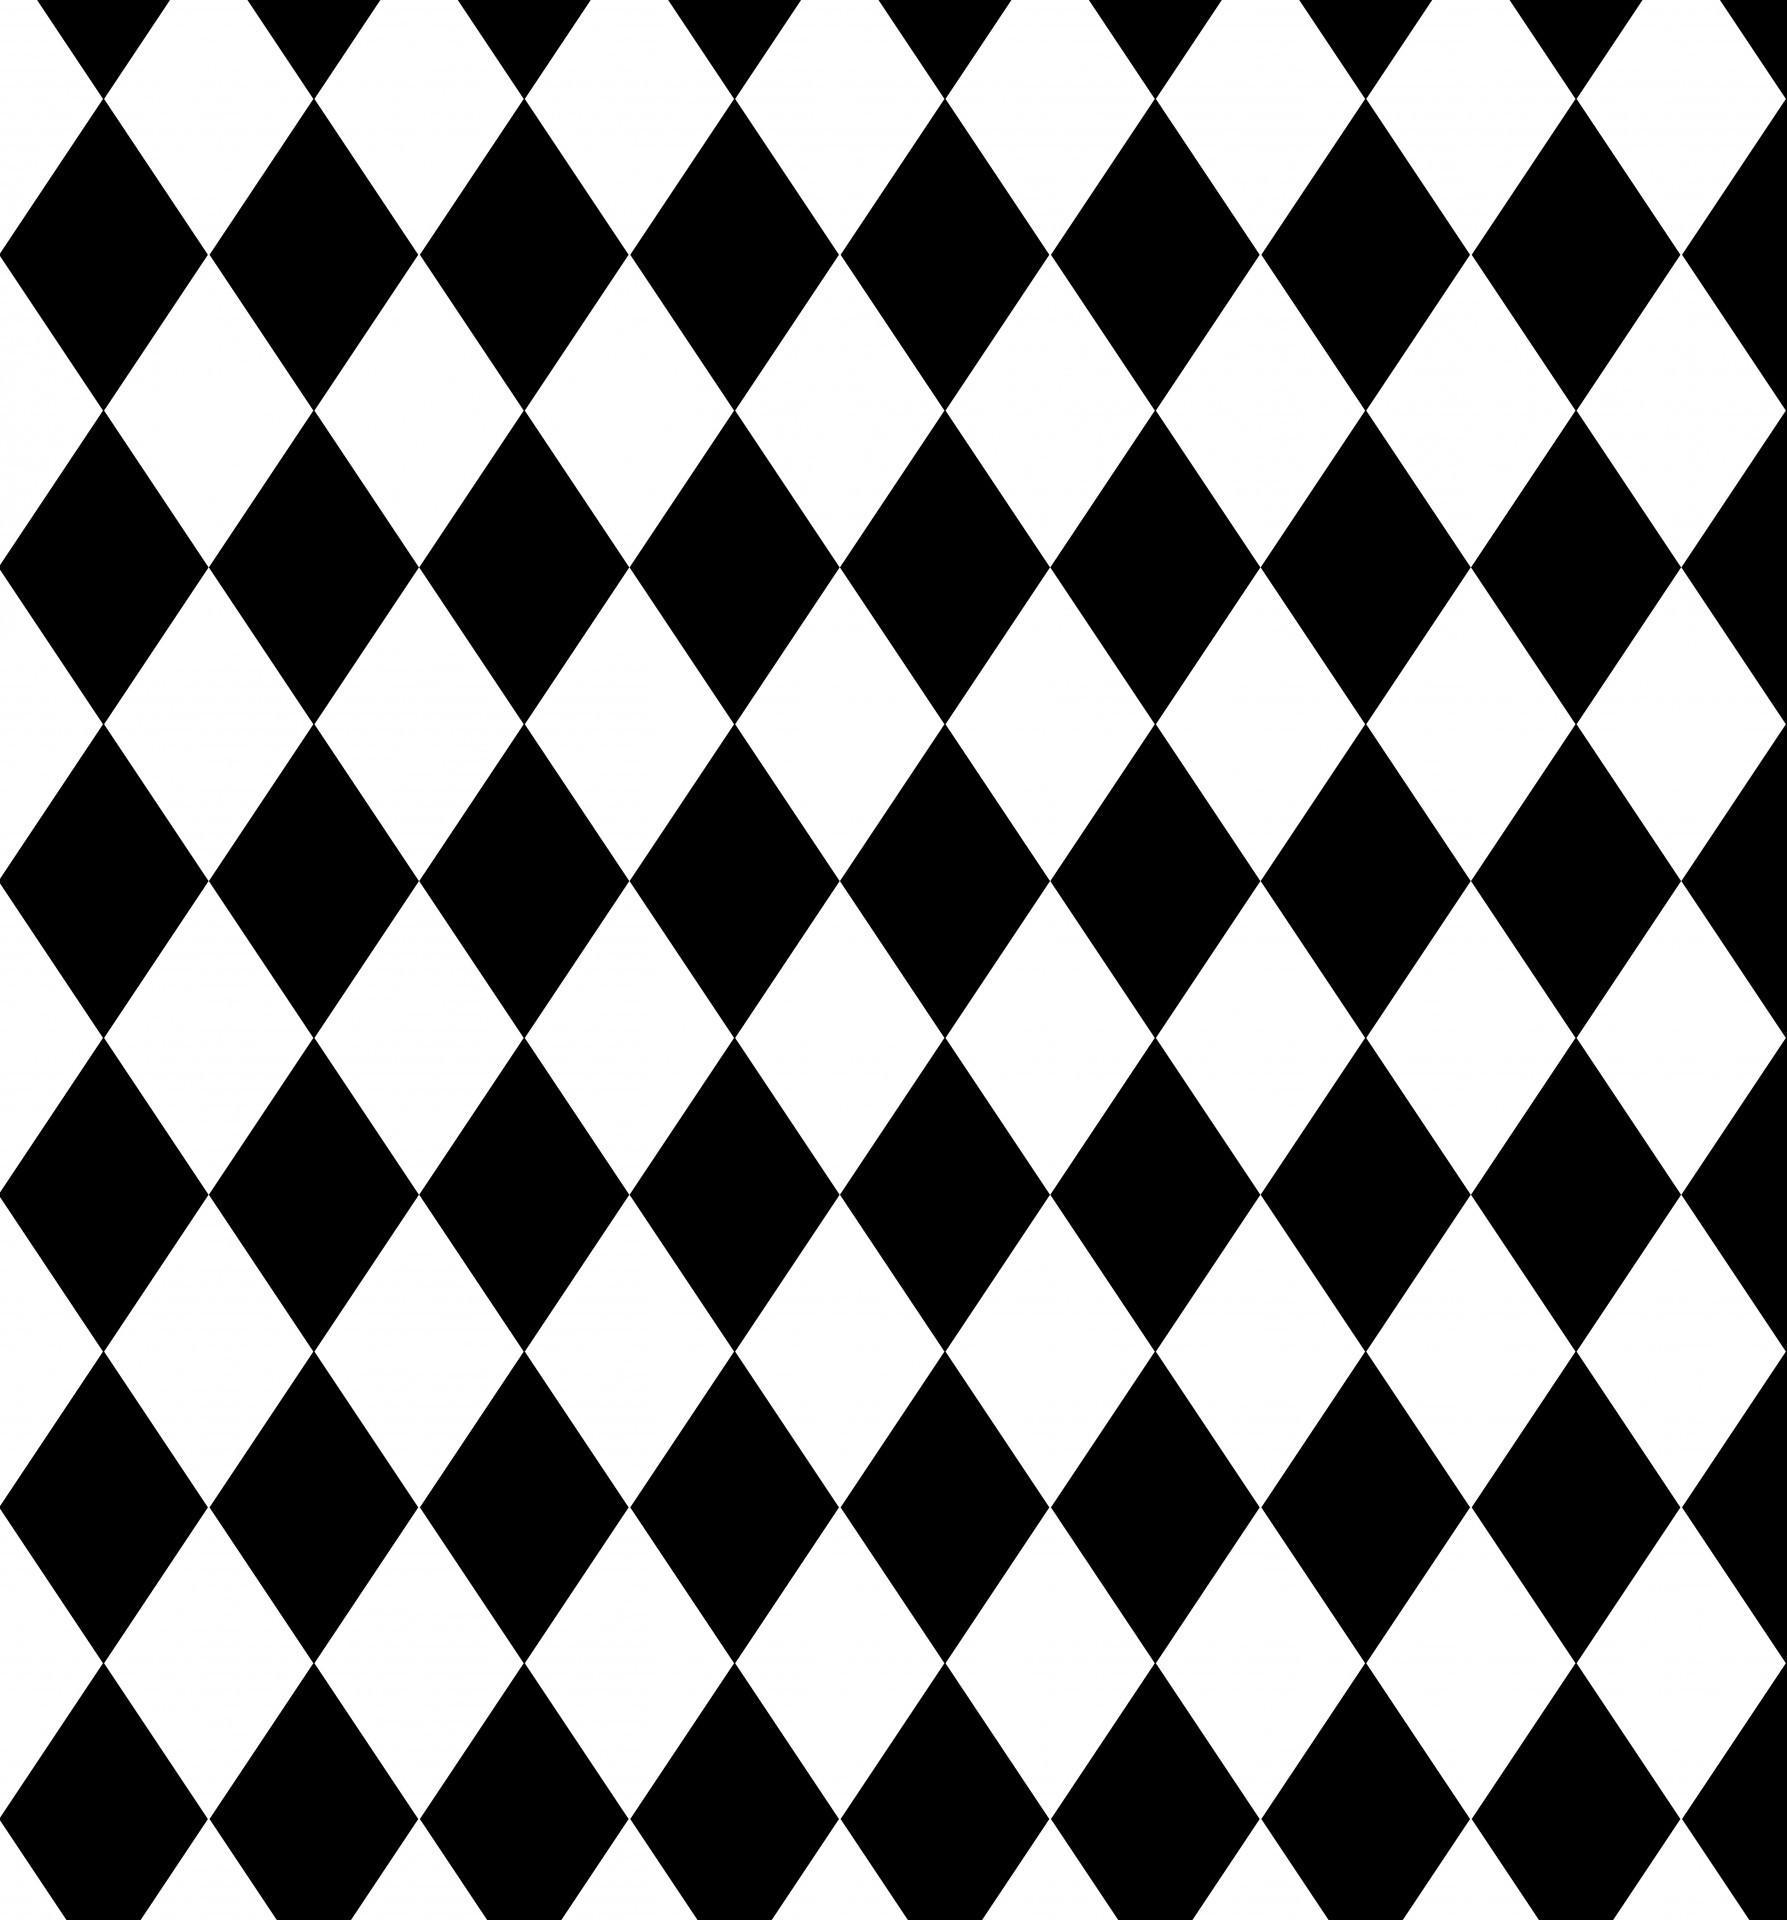 Res: 1787x1920, Diamonds Black And White